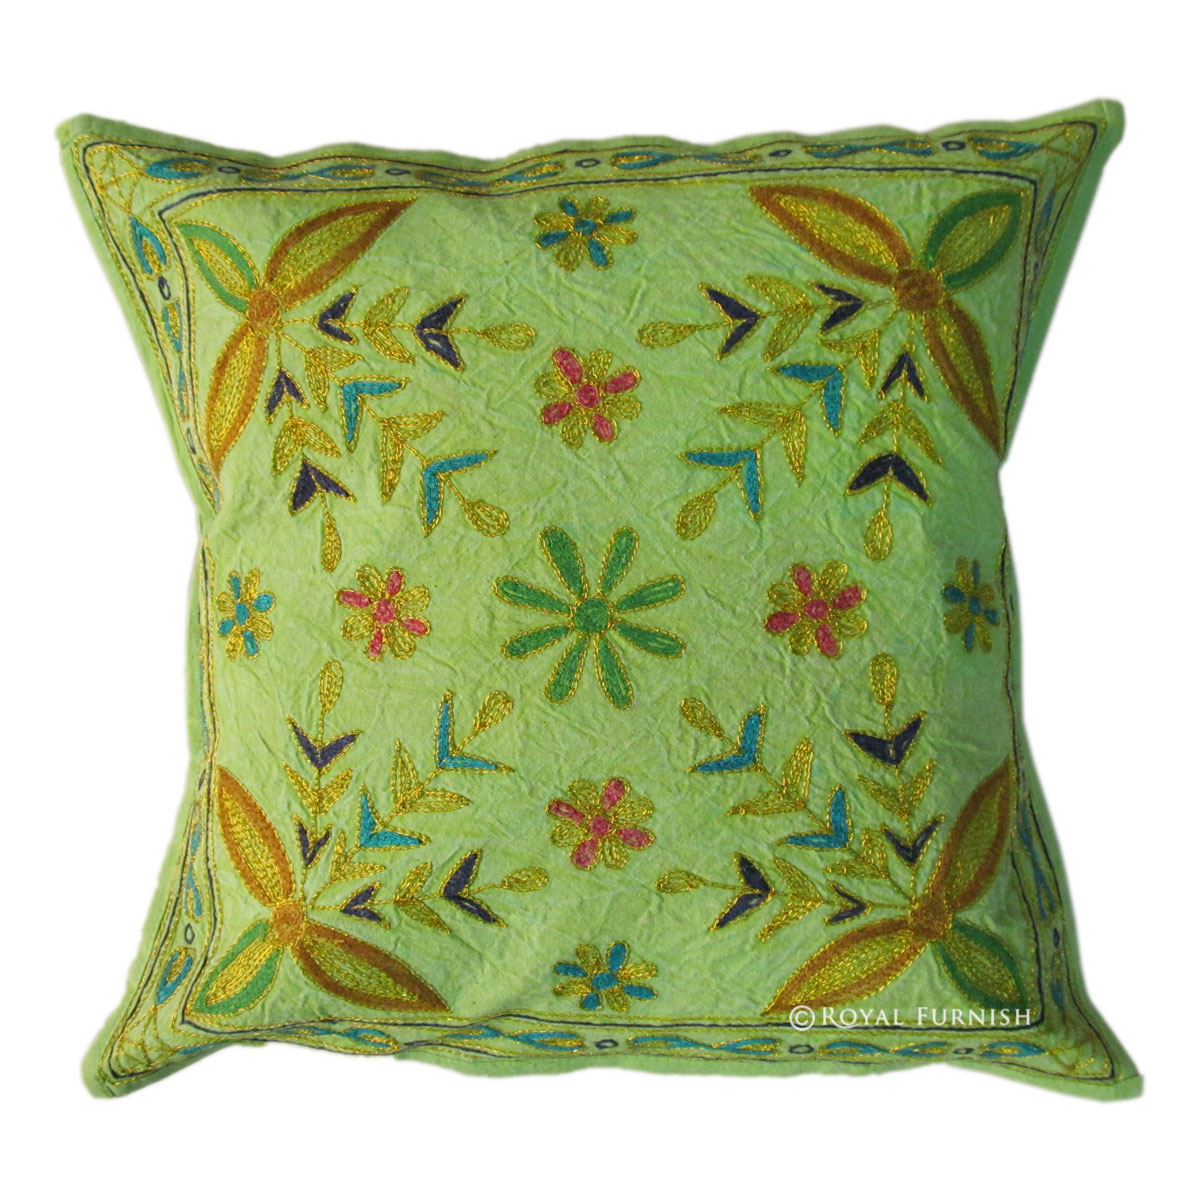 Embroidered Decorative Pillow : Indian Ari Zari Embroidered Decorative Floral Cotton Throw Pillow Case - RoyalFurnish.com